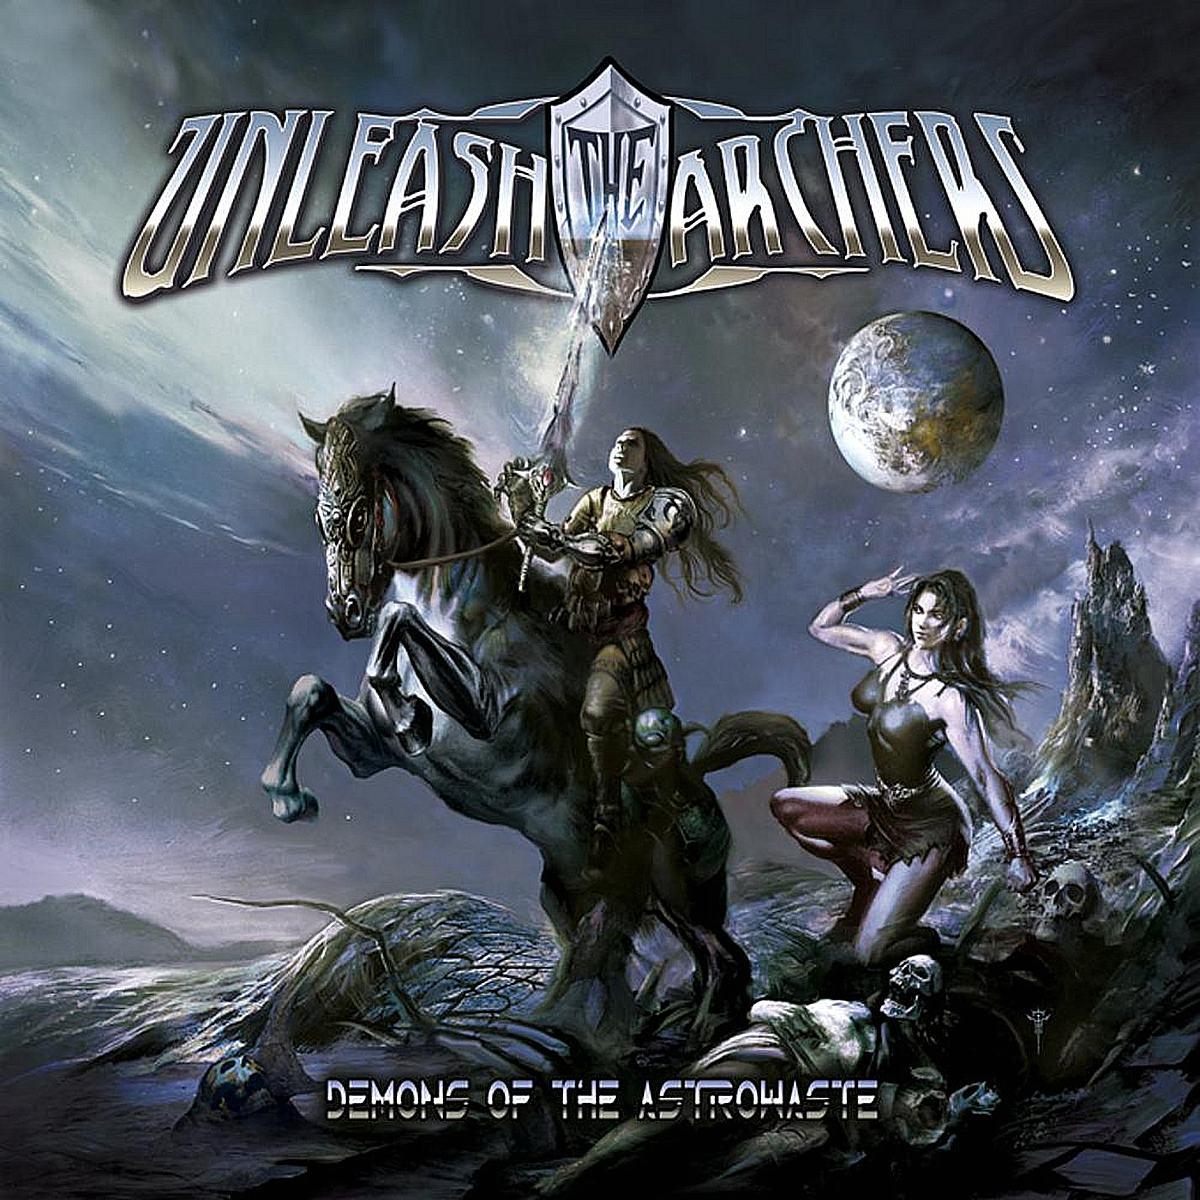 Unleash the Archers - Demons of the AstroWaste